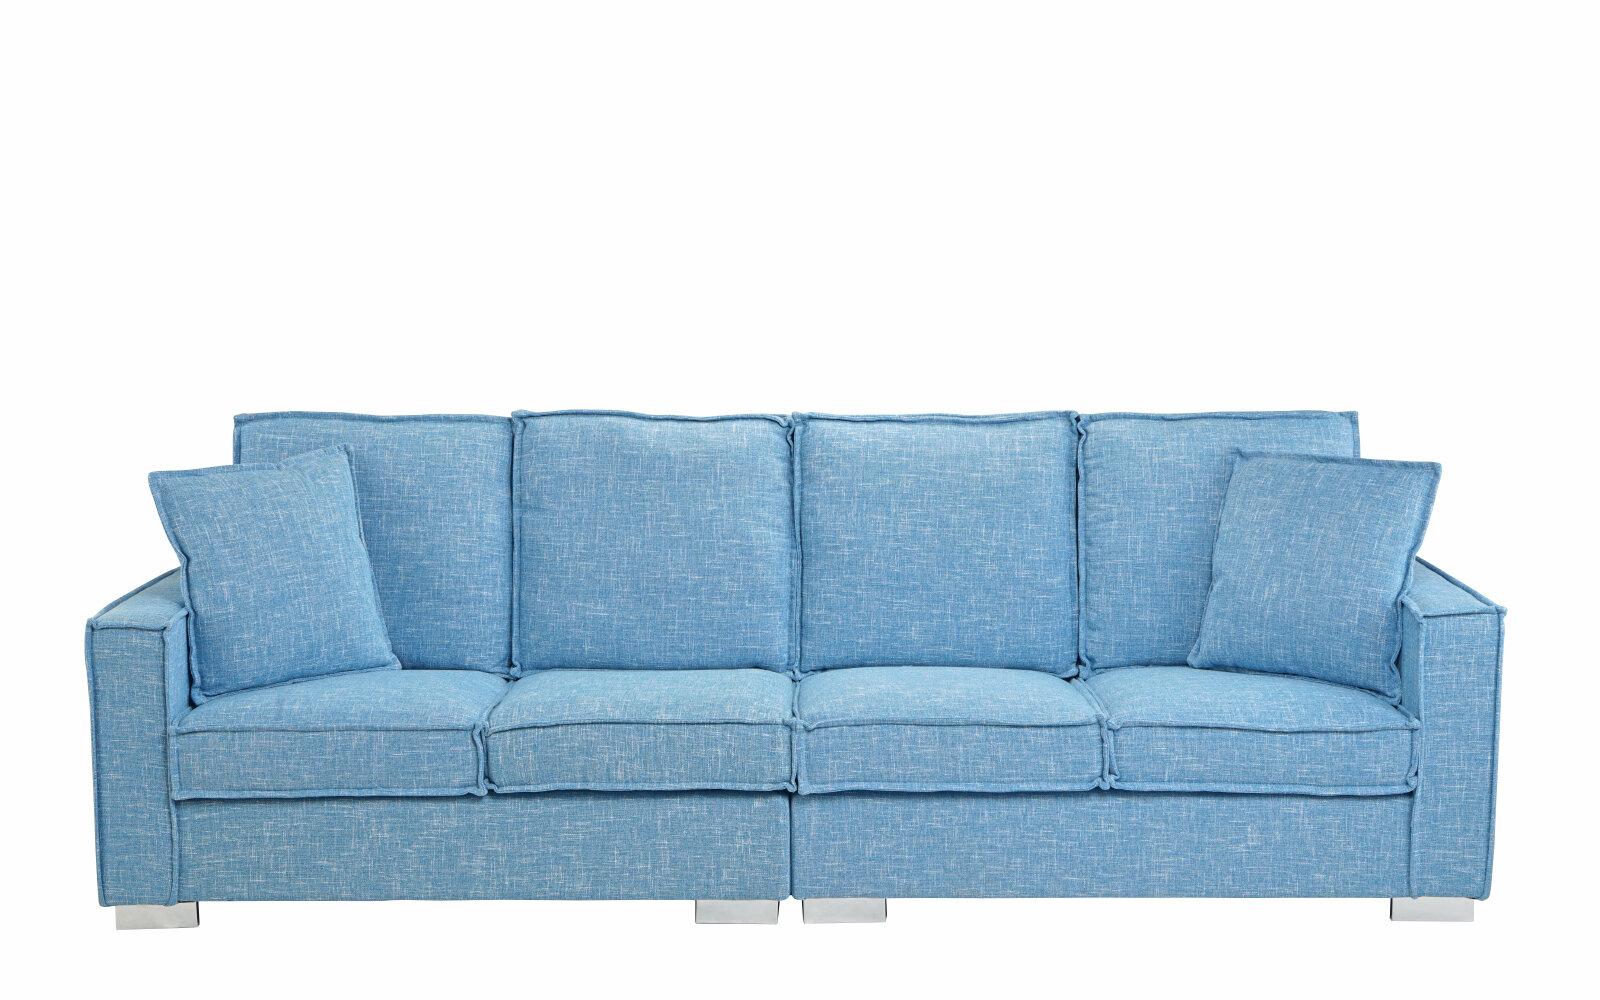 Orren Ellis Hubert Modern Low Frame Sofa | Wayfair